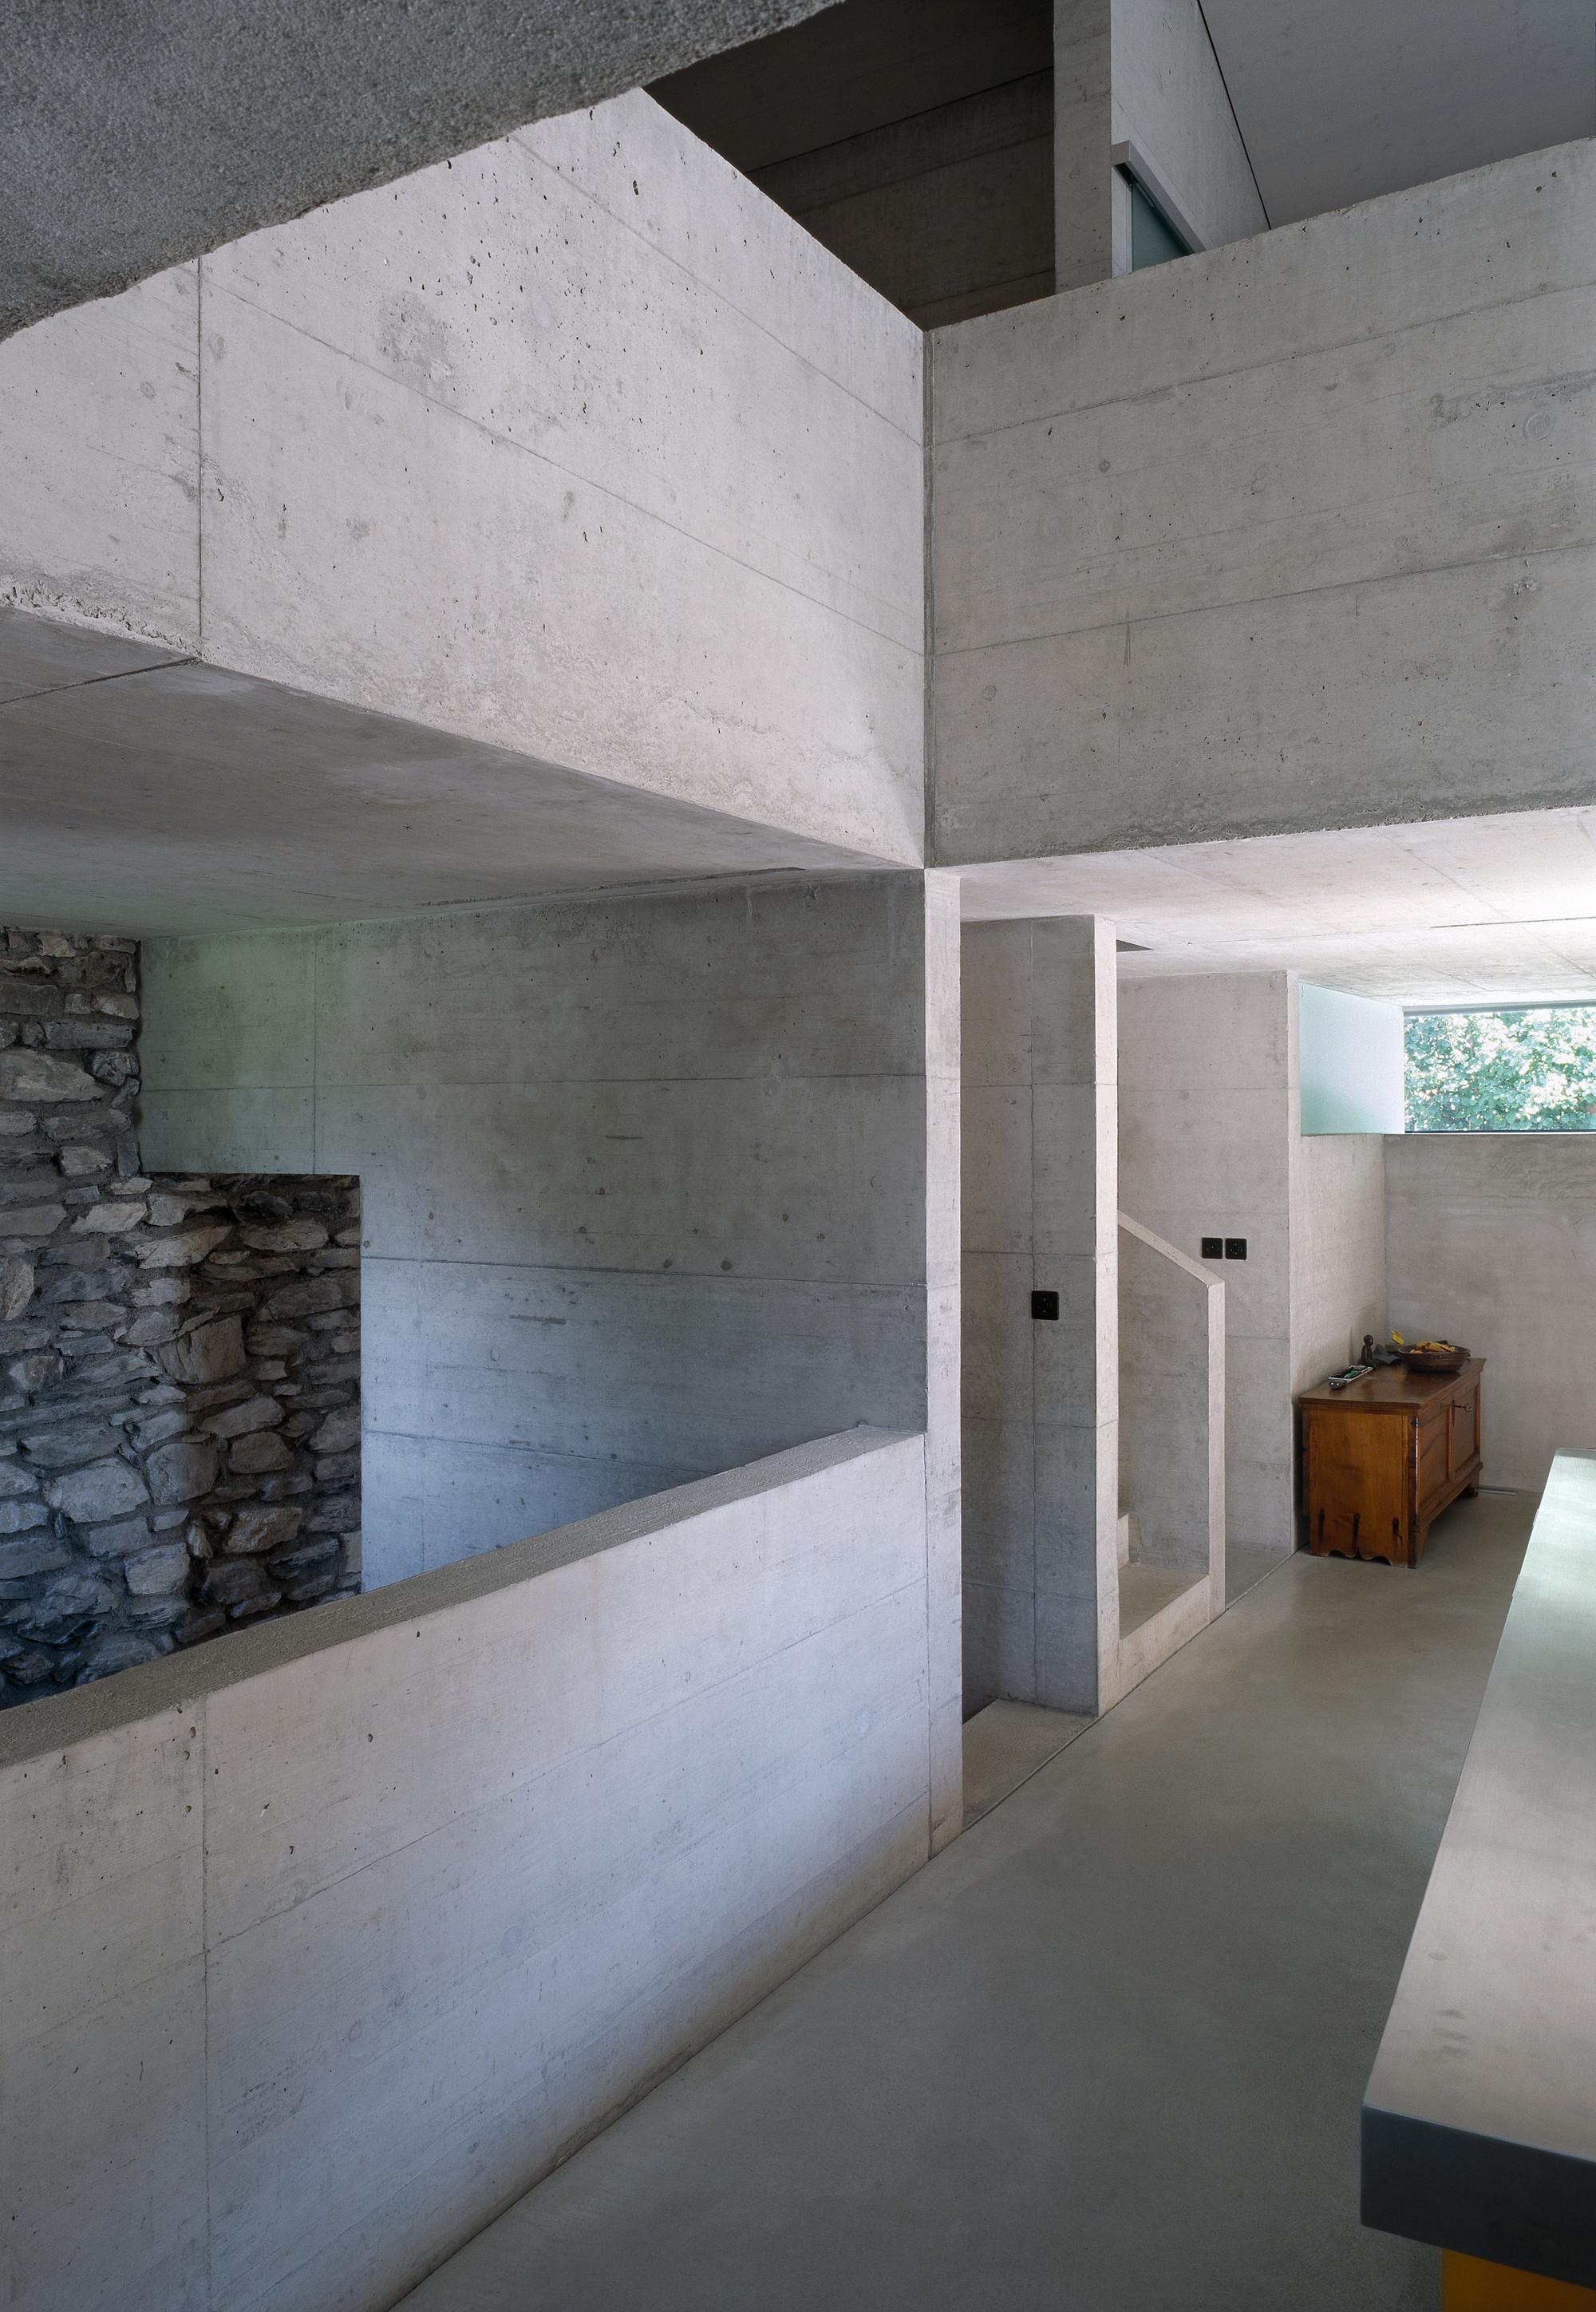 Gallery of roduit house transformation savioz fabrizzi architectes 5 - Best architectes ...